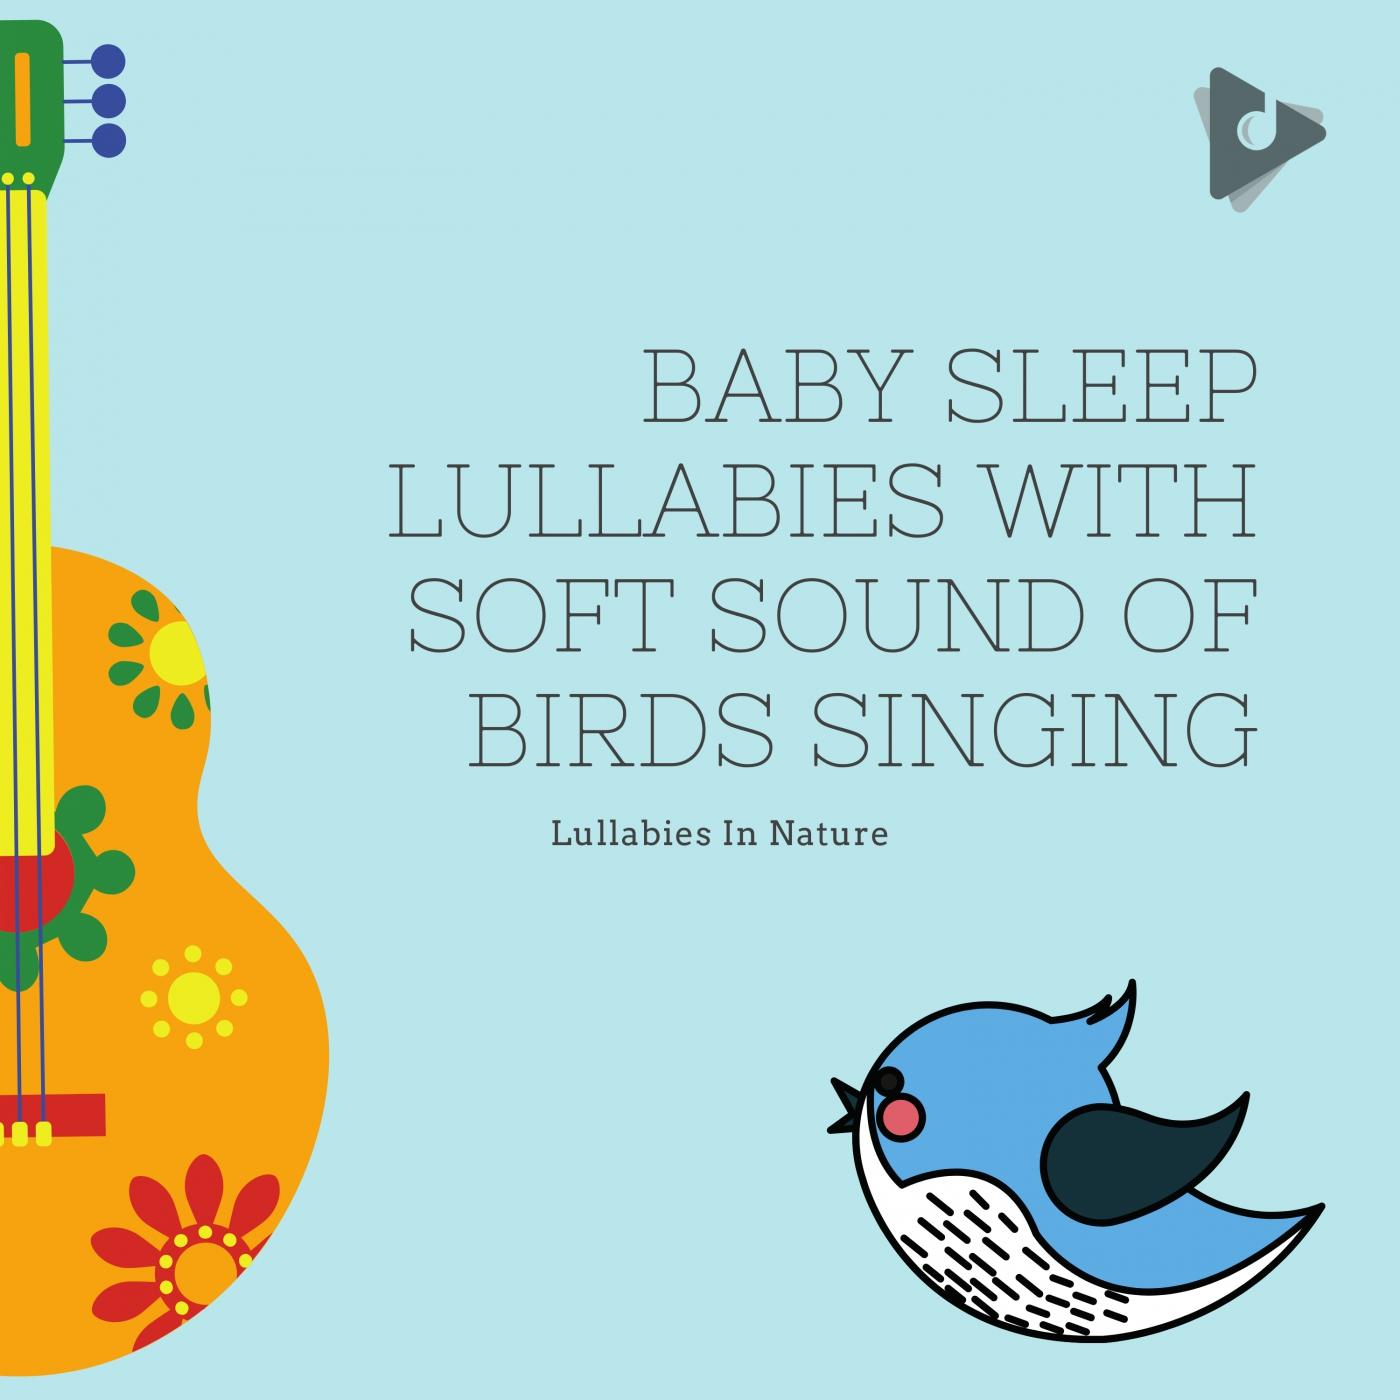 Baby Sleep Lullabies with Soft Sound of Birds Singing